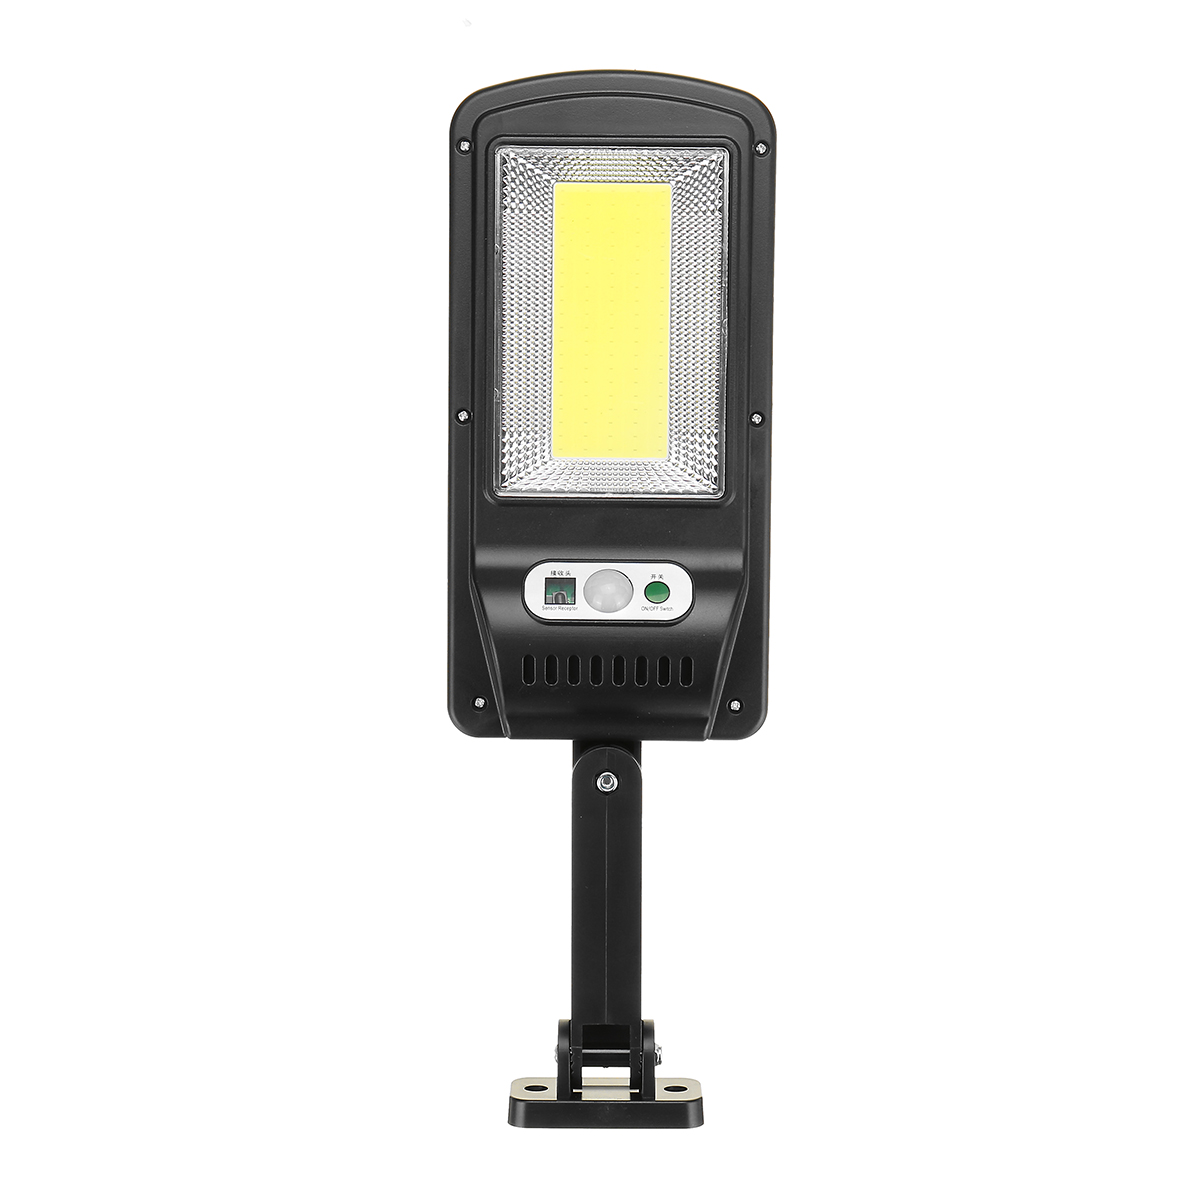 Led Solar Street Lights Outdoor Security Lighting Wall Lamp Waterproof Motion Sensor Smart Control Lamp 2100 single side